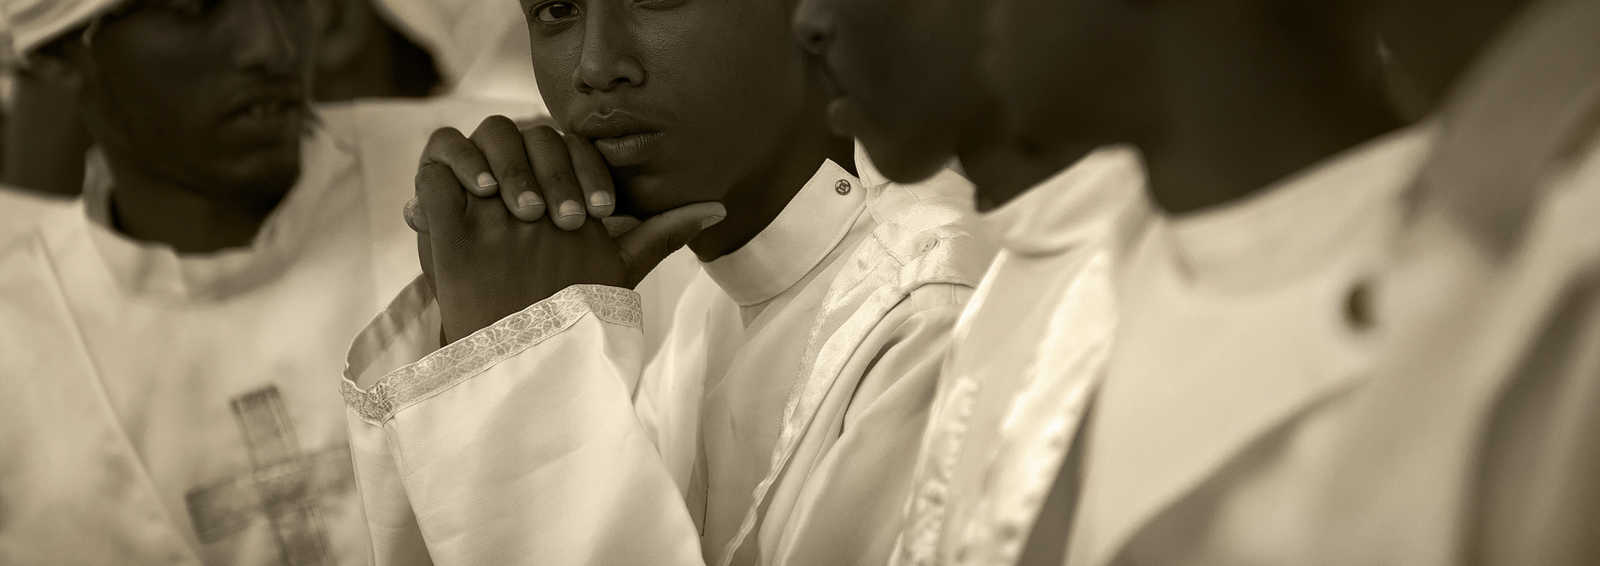 Line of Priests, Ethiopia